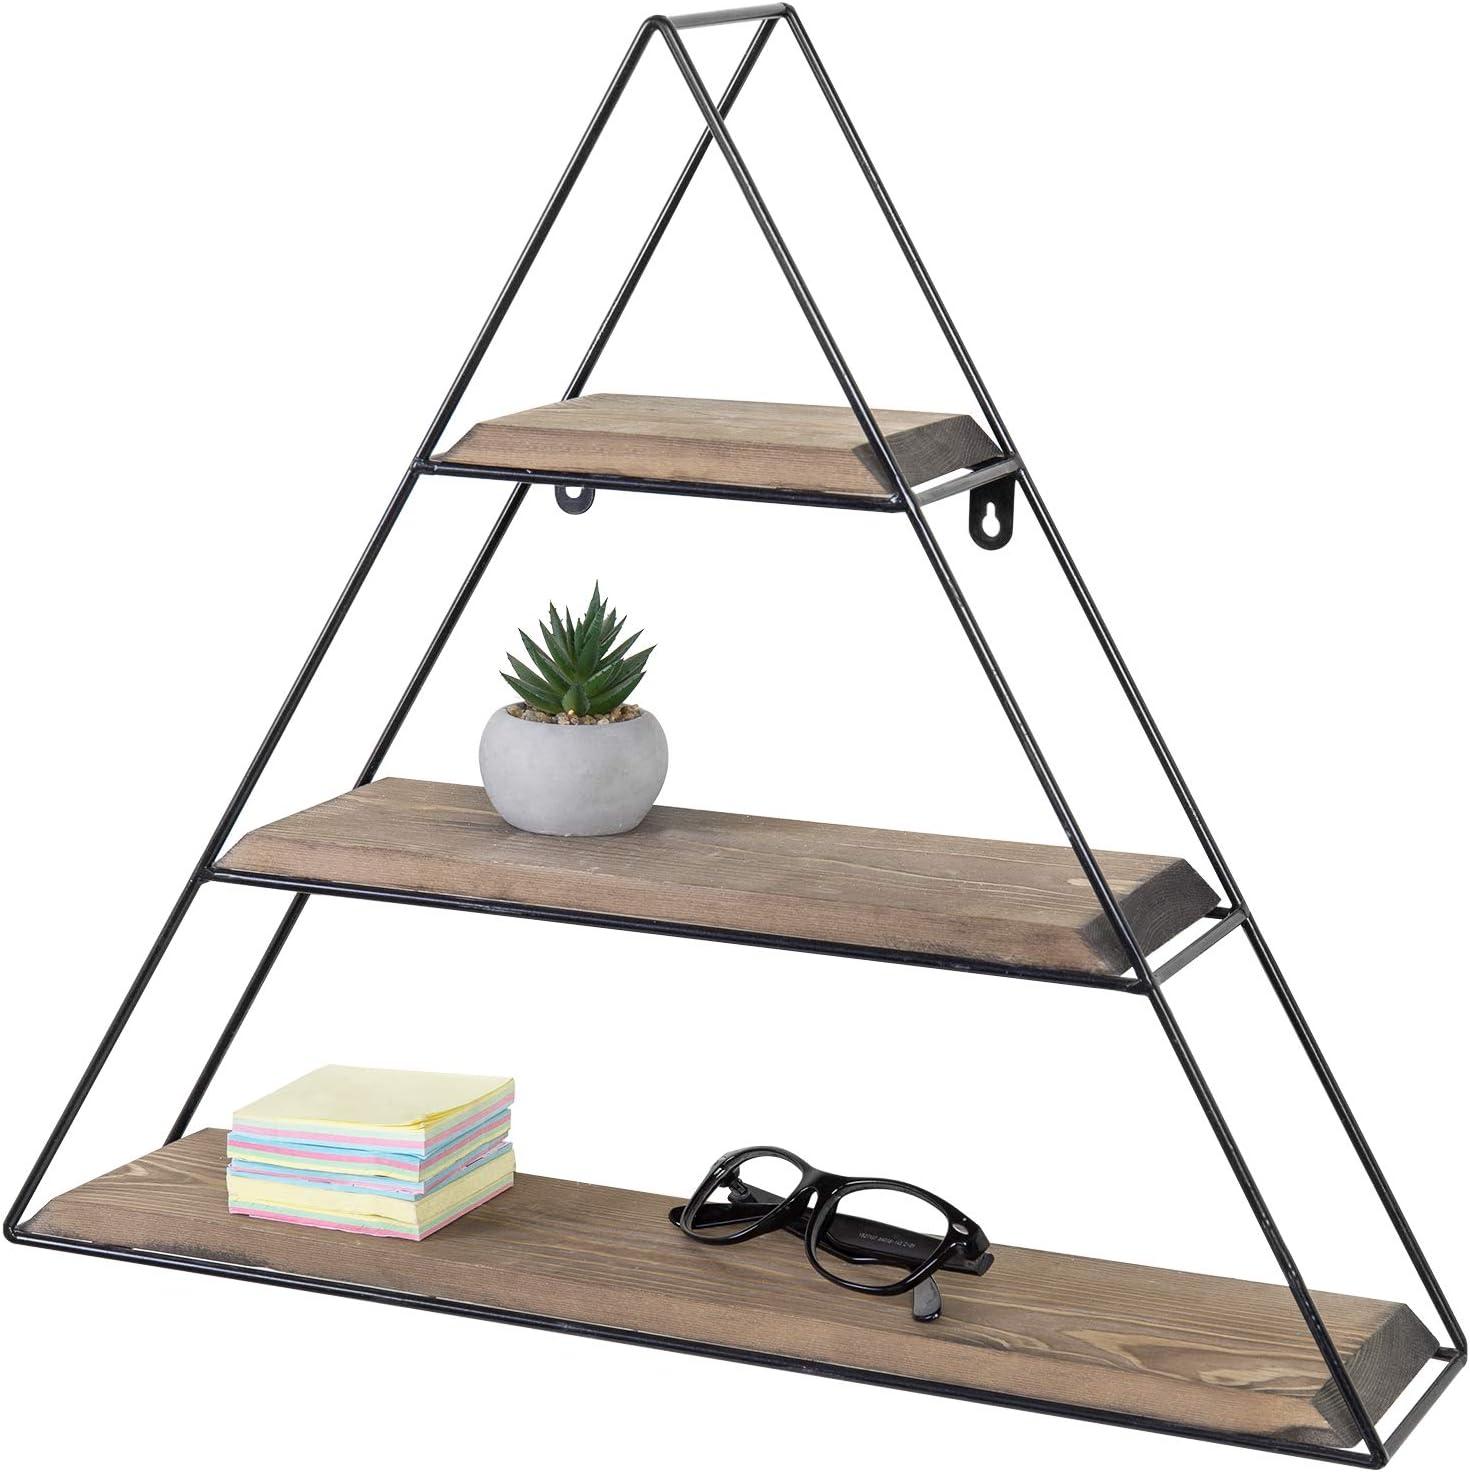 MyGift 3-Tier Triangle Design Wall Mounted Coffee Brown Wood & Metal Shelf